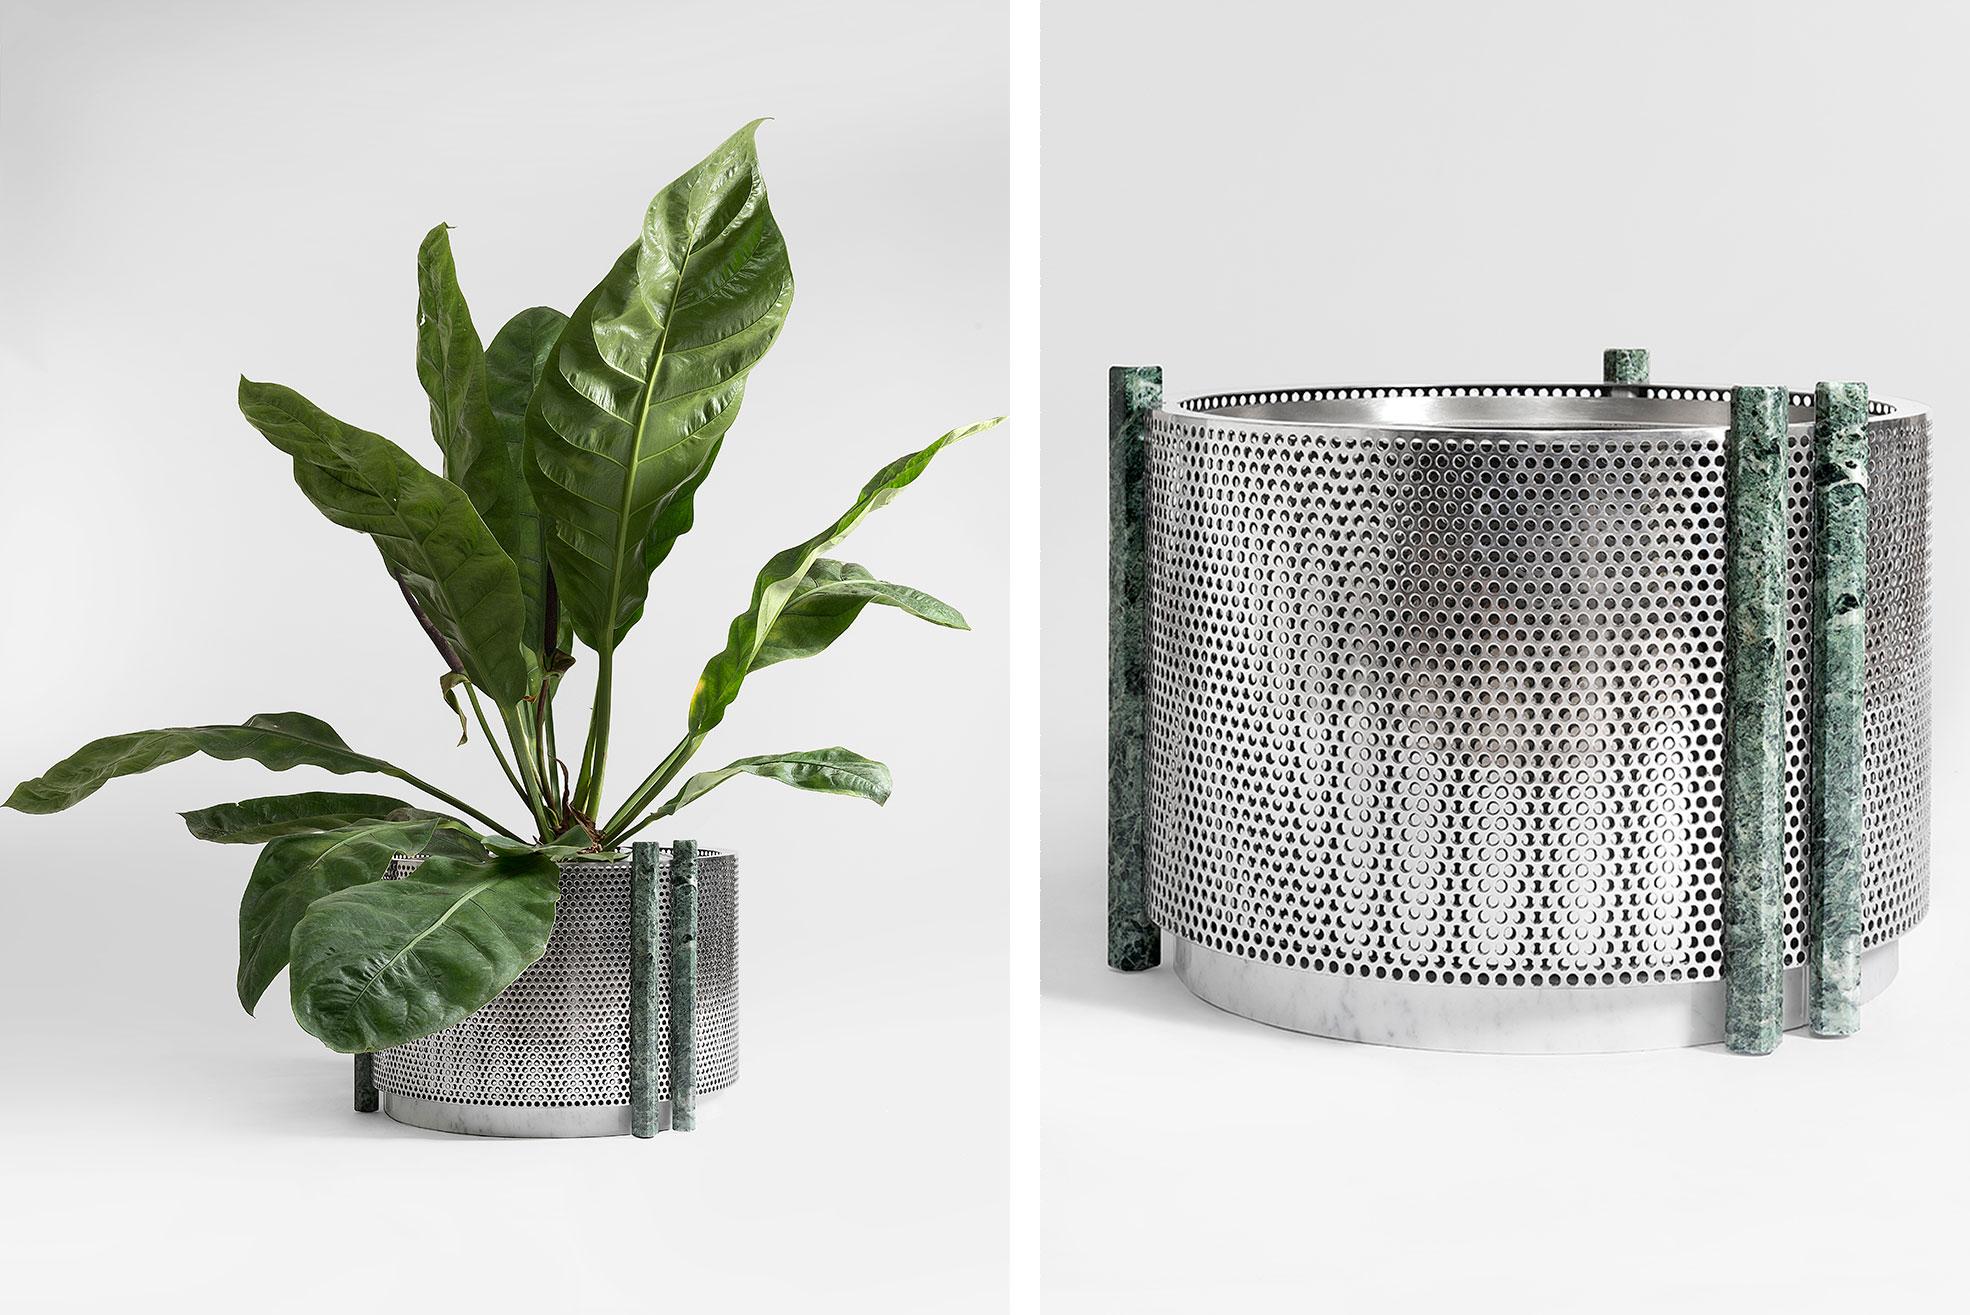 Metal Vase medium size with green marble design by Derek Castiglioni Photographer Maria Teresa Furnari